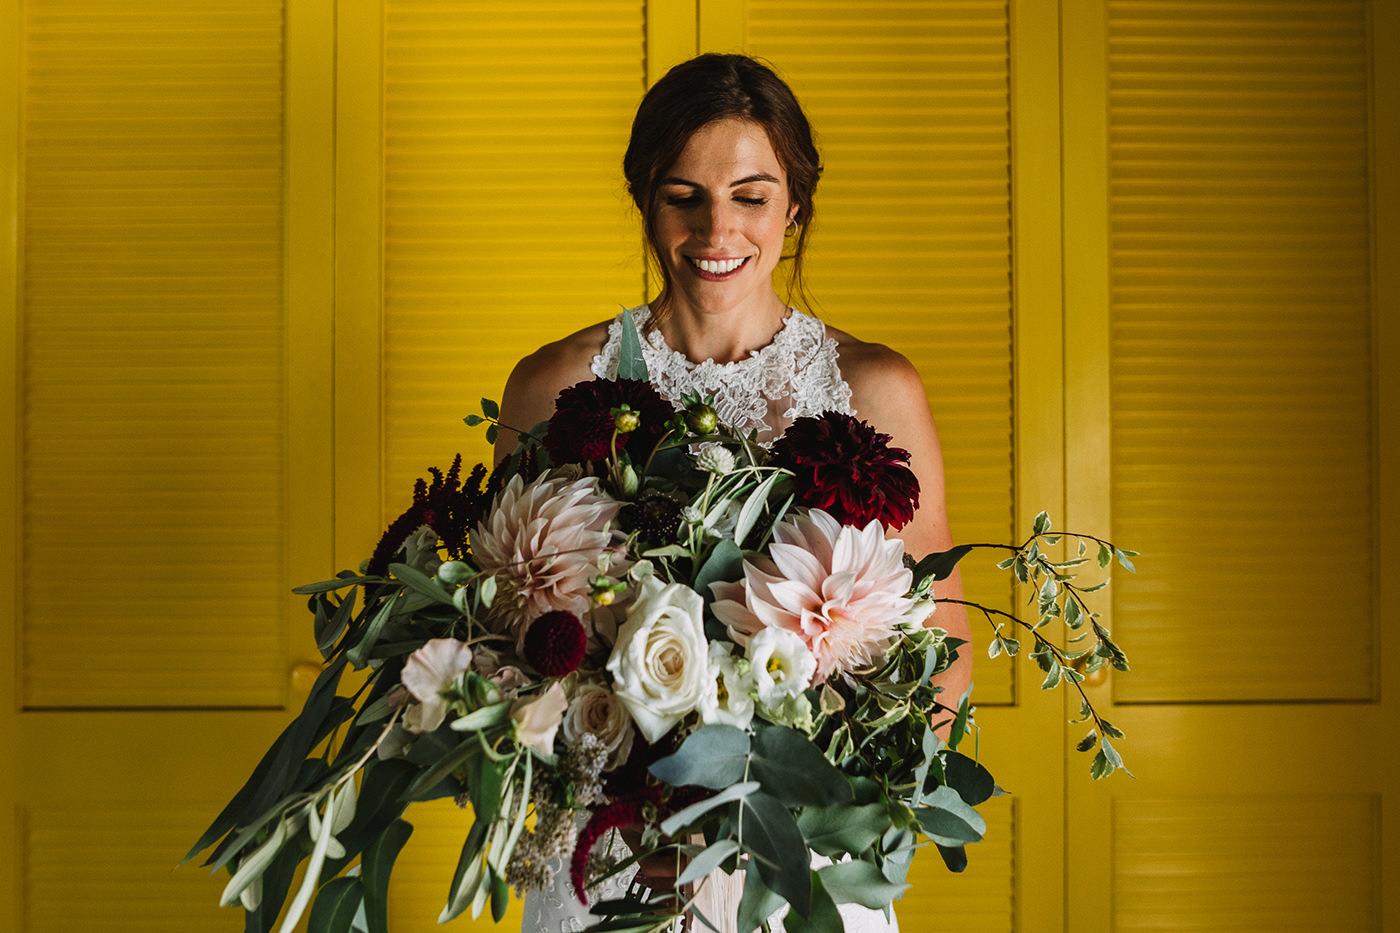 wedding_photographer_nz-00091.jpg